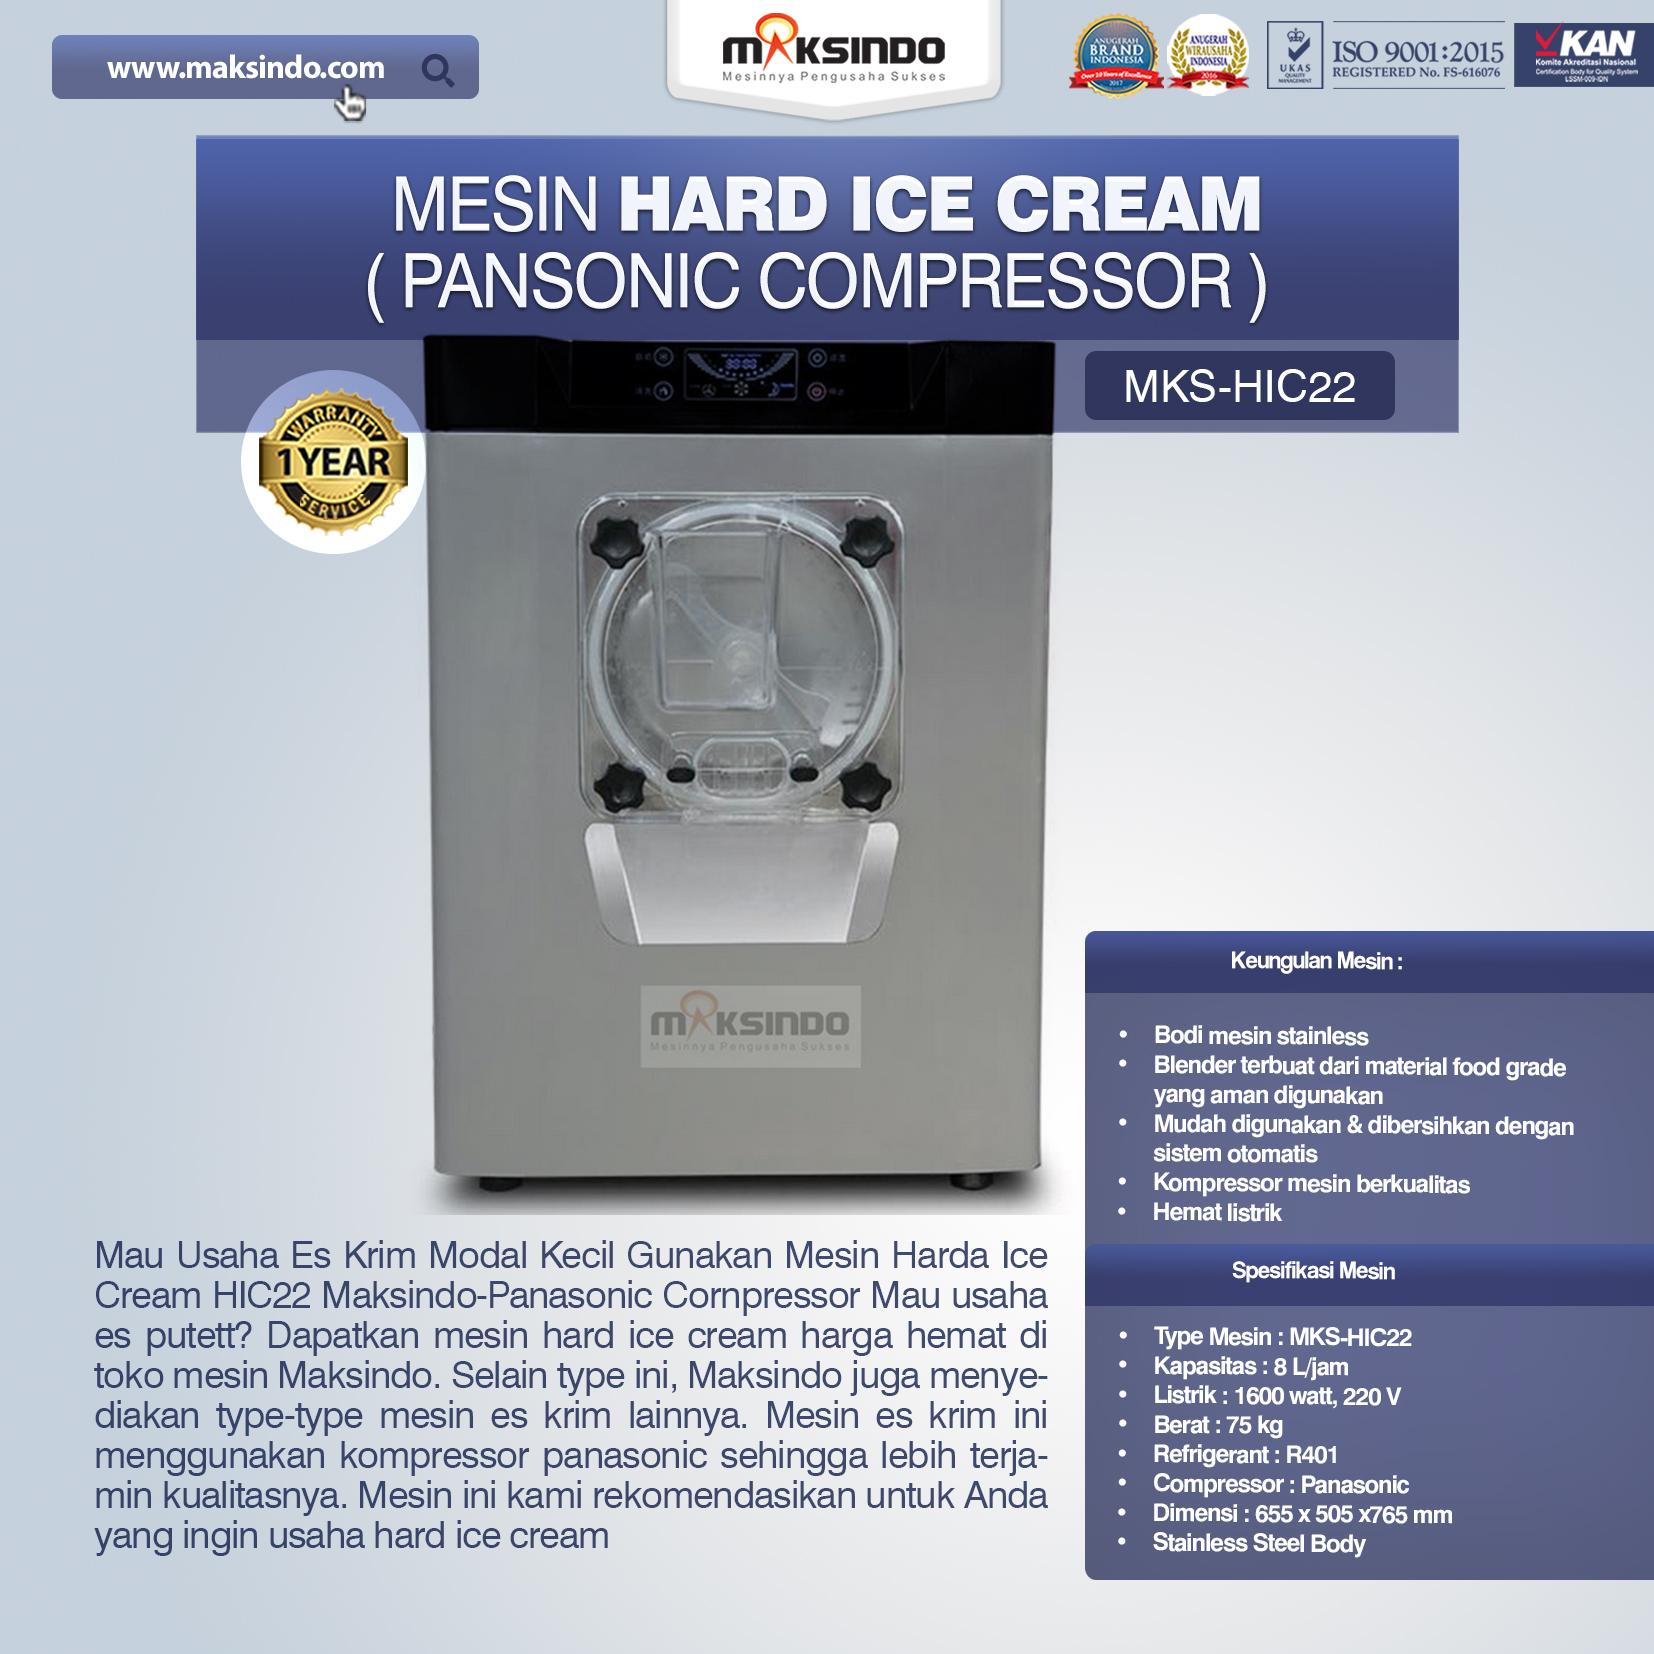 Mesin-Hard-Ice-Cream-MKS-HIC22